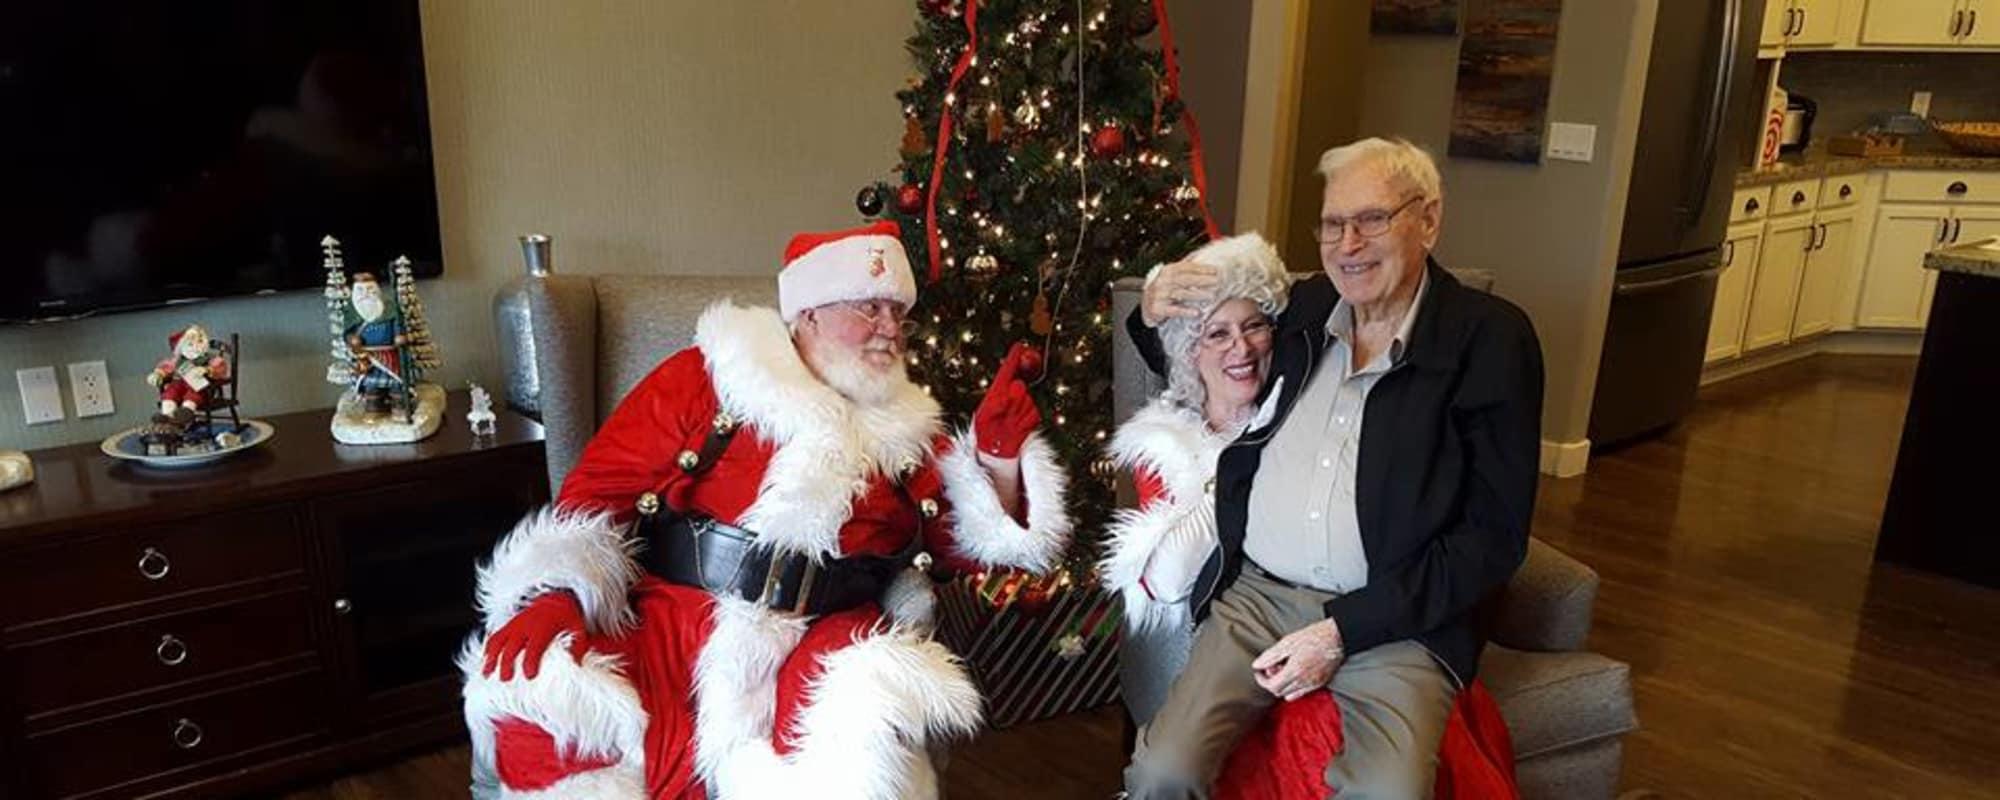 Seniors sitting with Santa at Hacienda Del Rey in Litchfield Park, Arizona